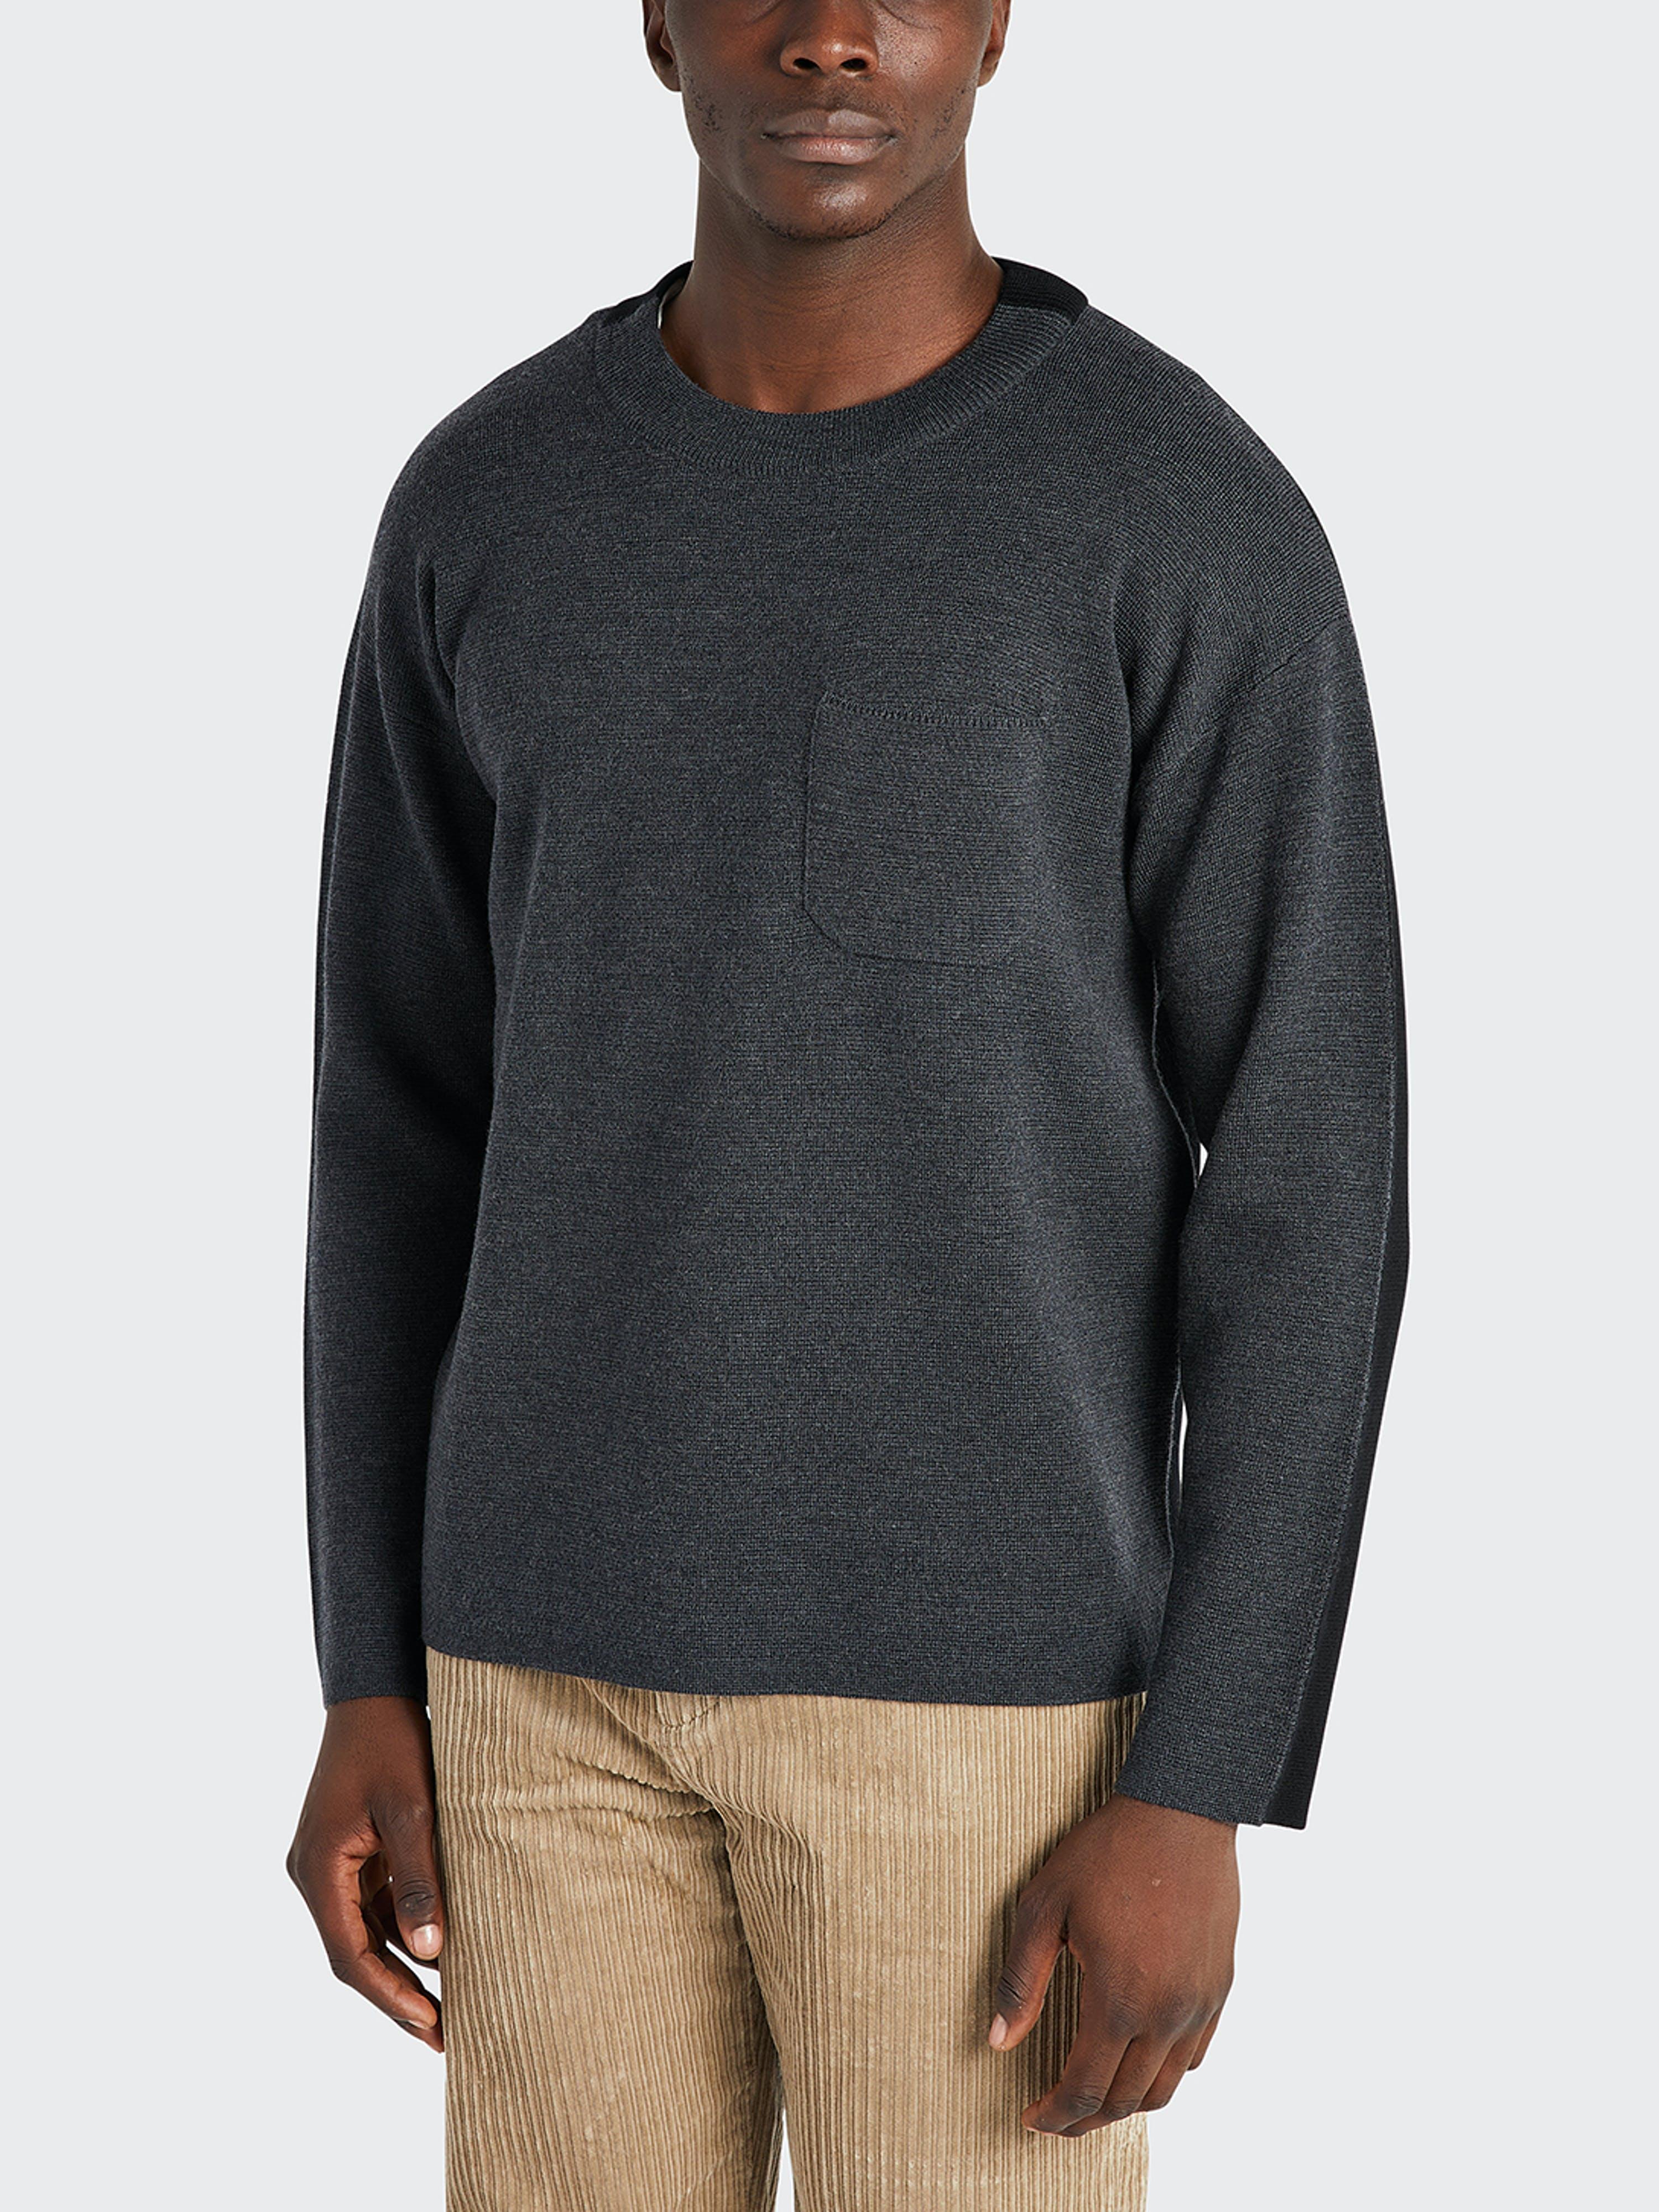 ONS Clothing Ealing Pocket Sweater  - Grey